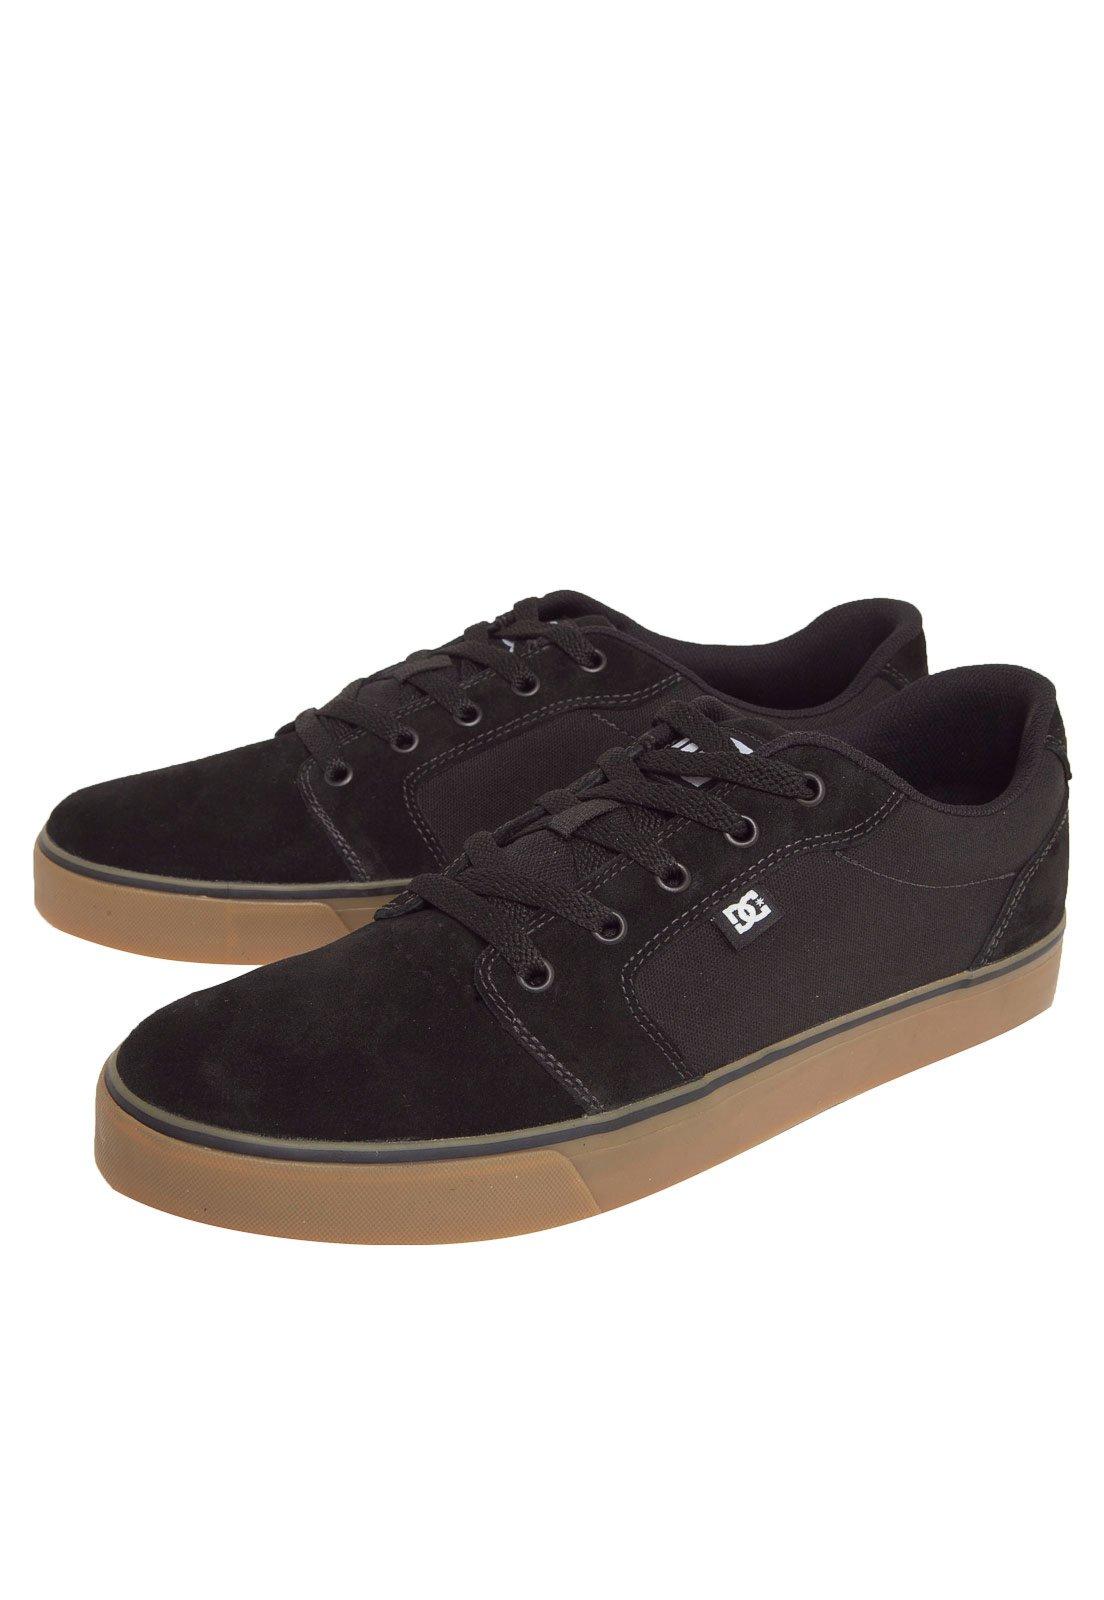 Tênis DC Shoes Anvil 2 La Preto - Compre Agora  bd2e38981d41f